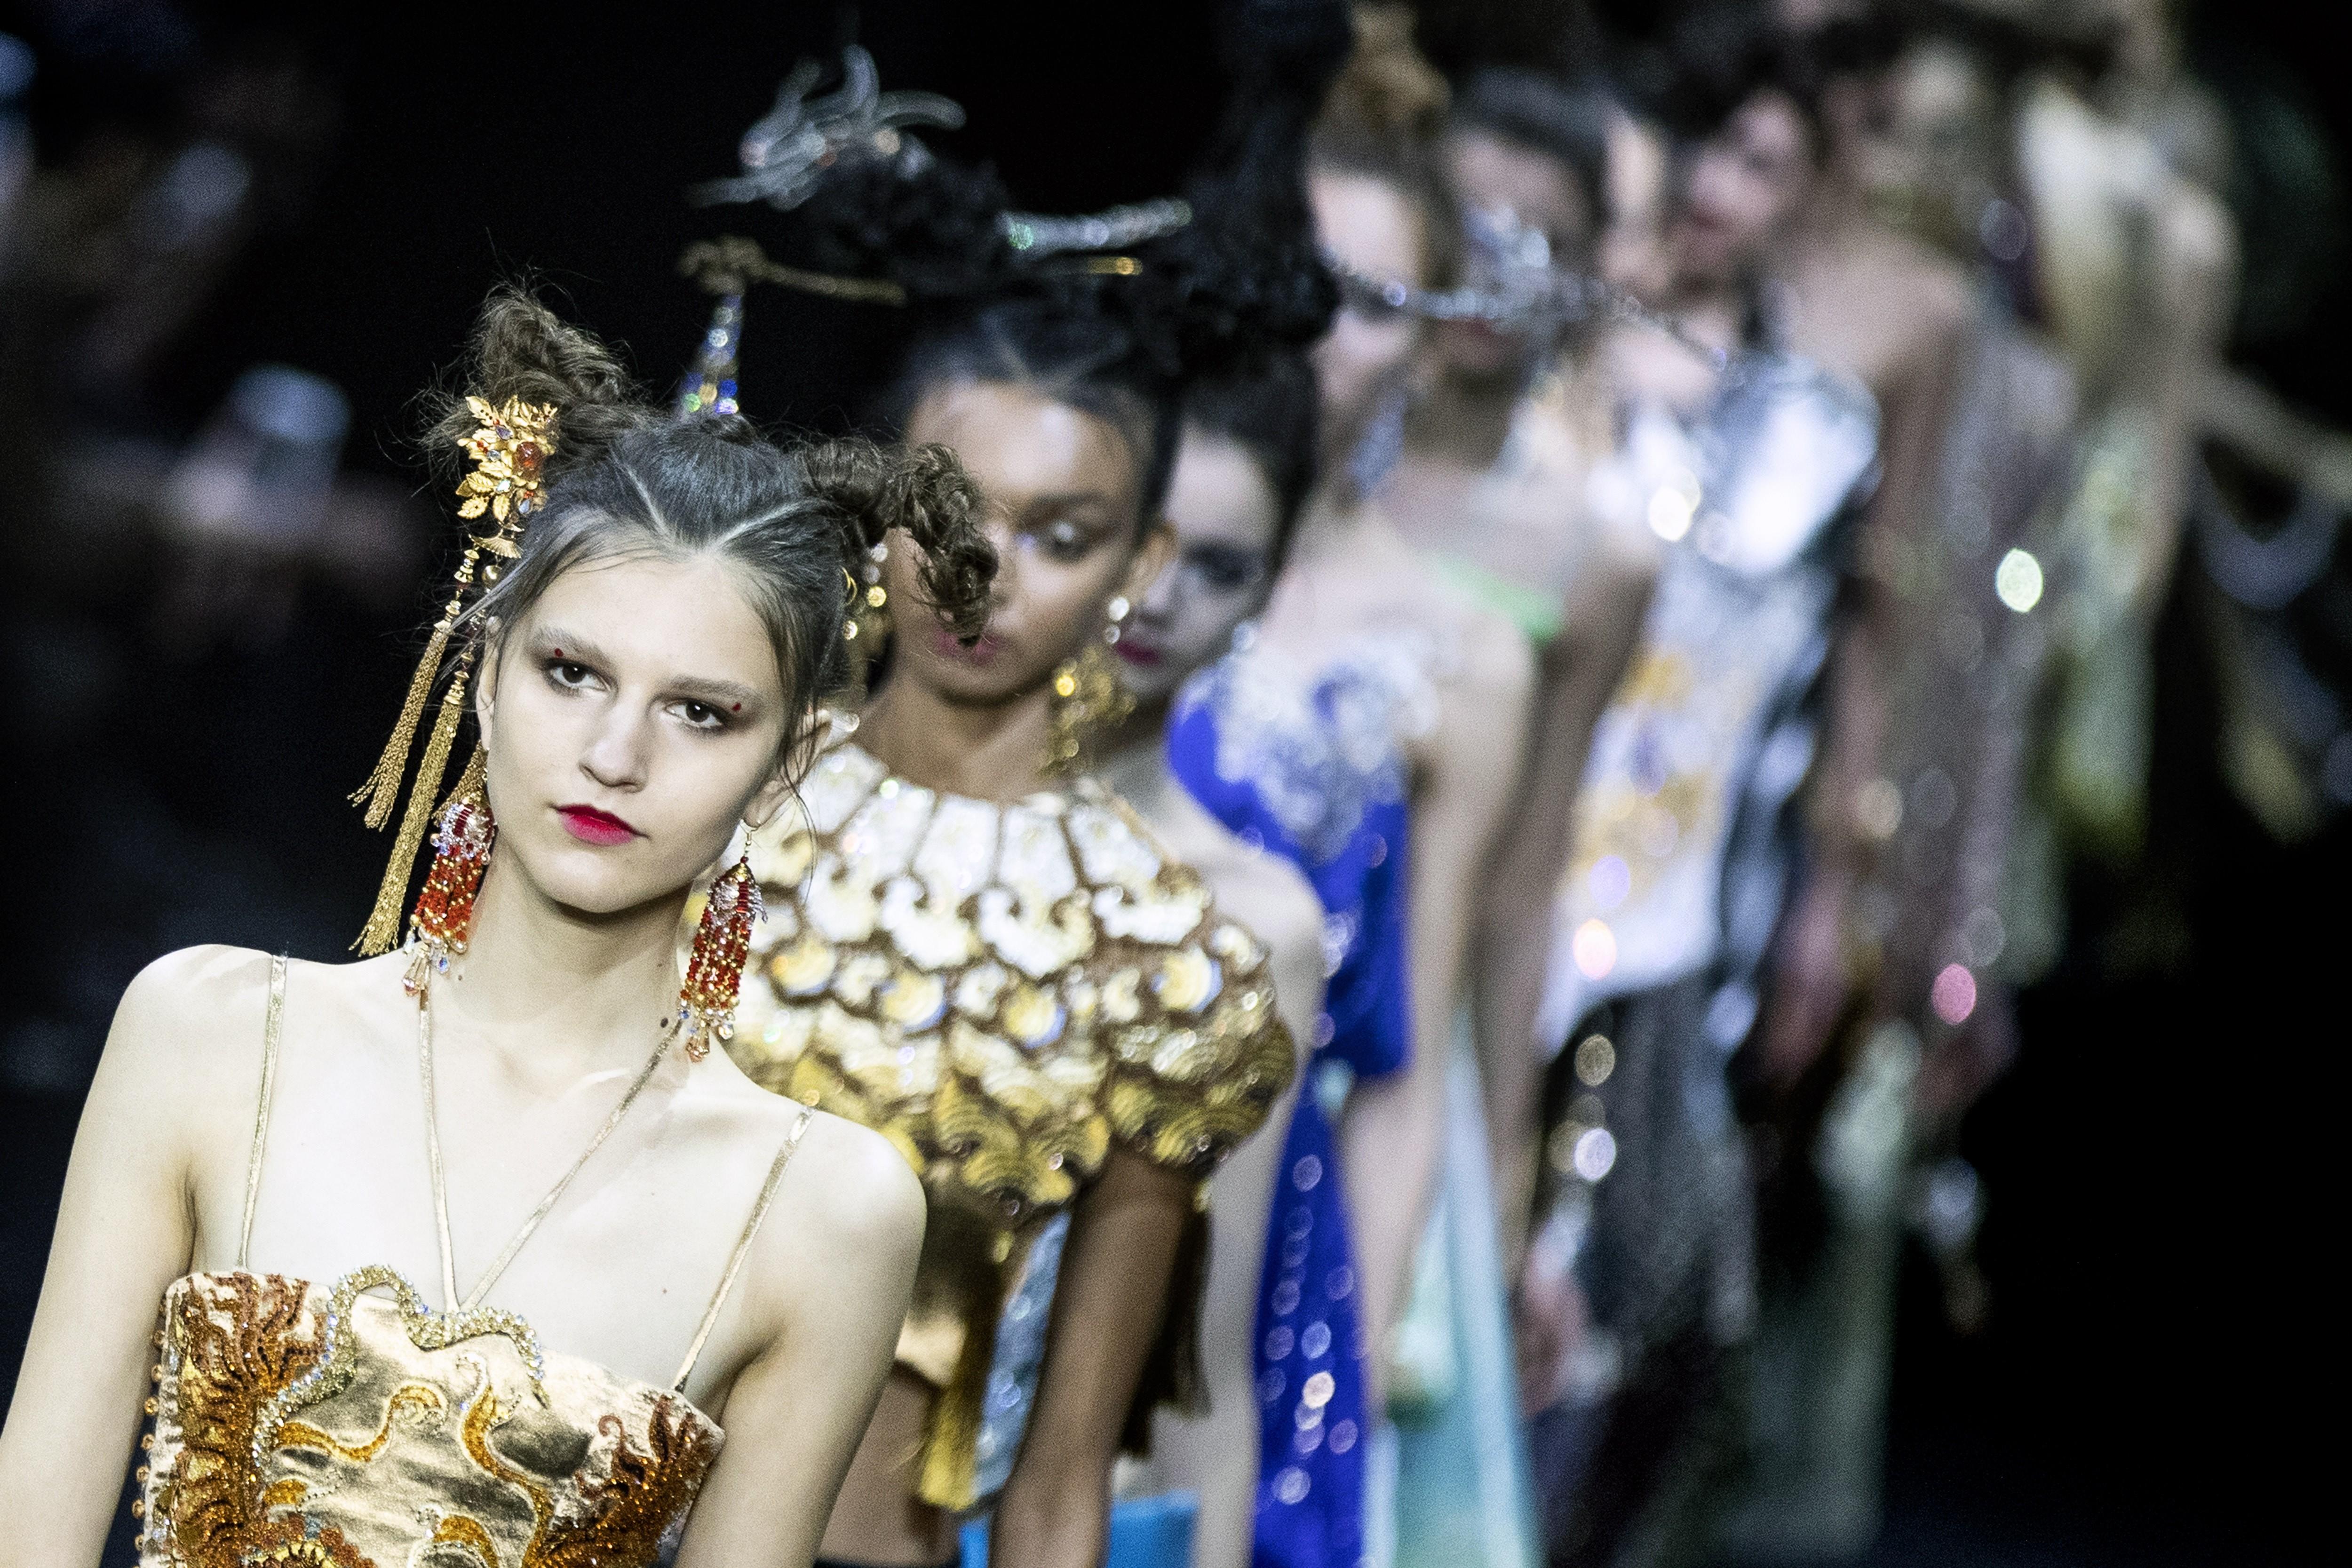 Paris Haute Couture 2019: China's fashion 'queen' Guo Pei's